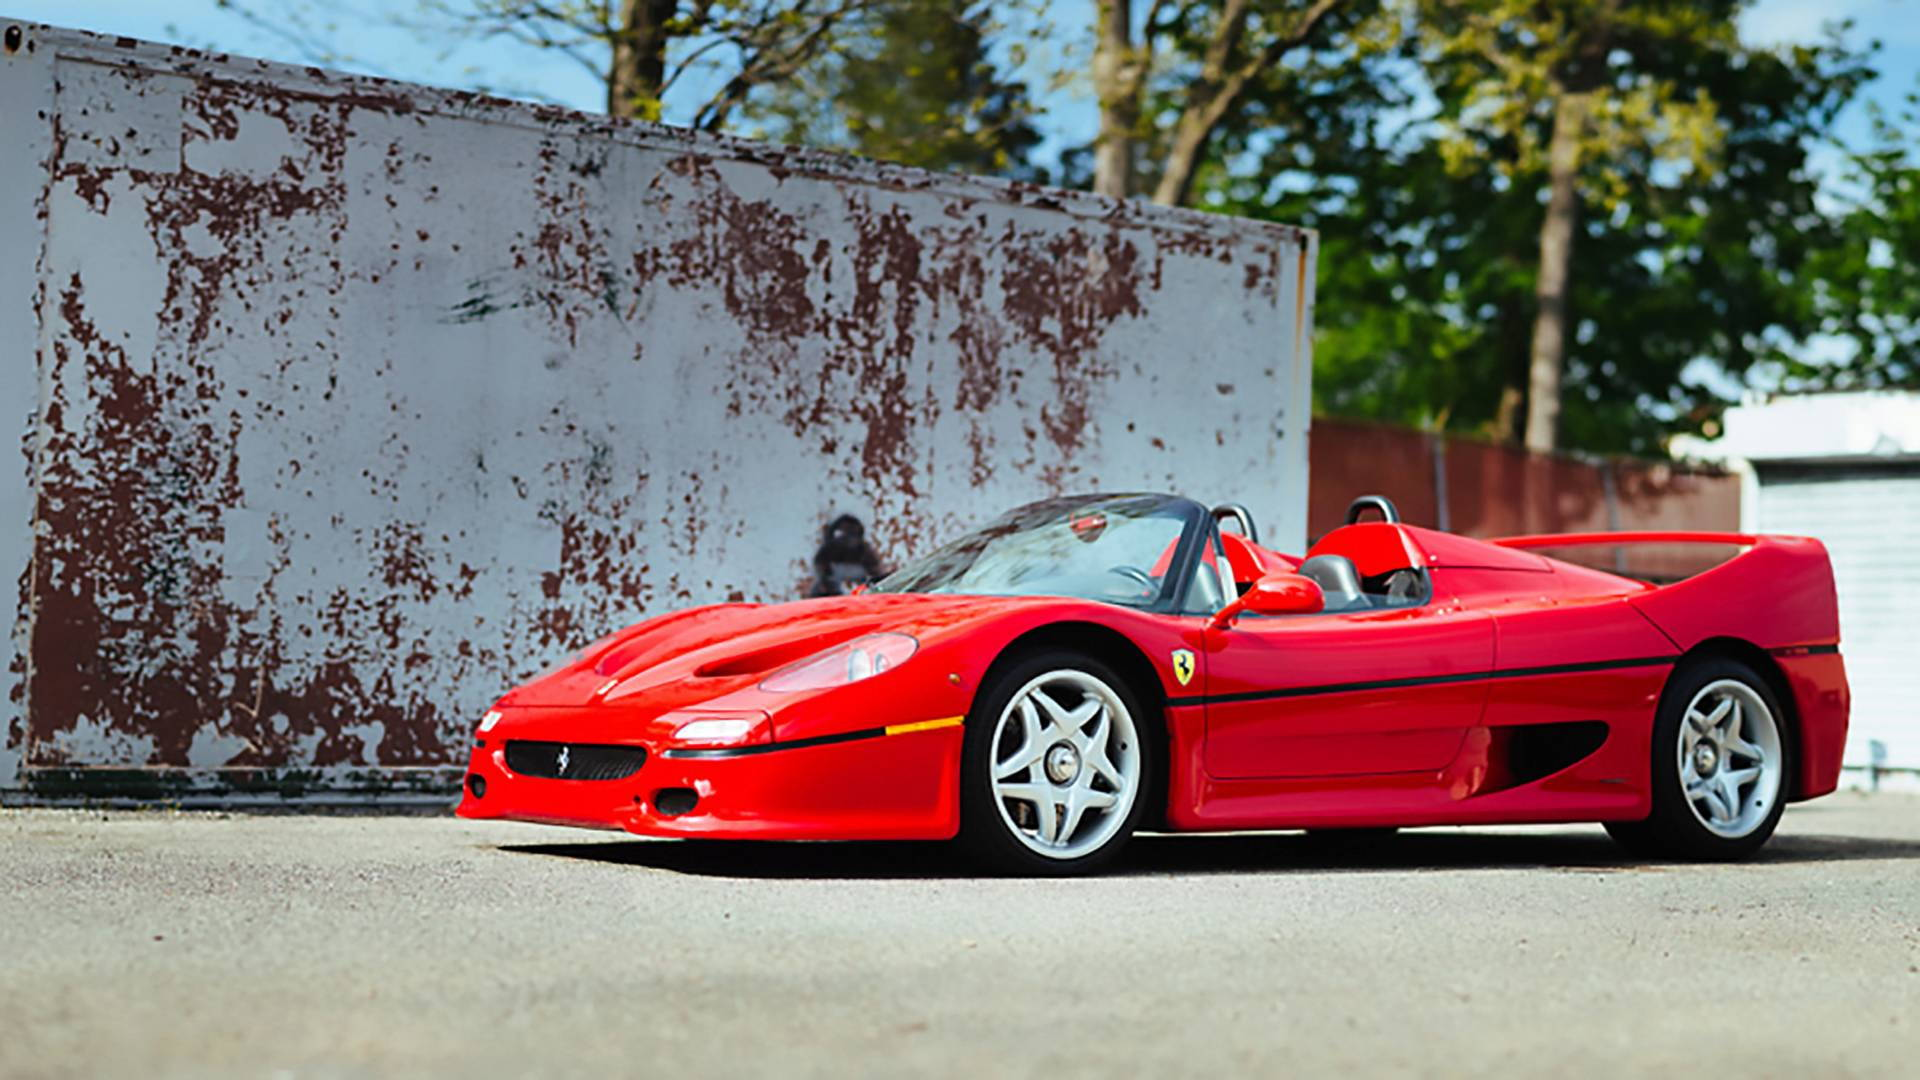 1995 Ferrari F50 prototype bearing chassis No. 99999